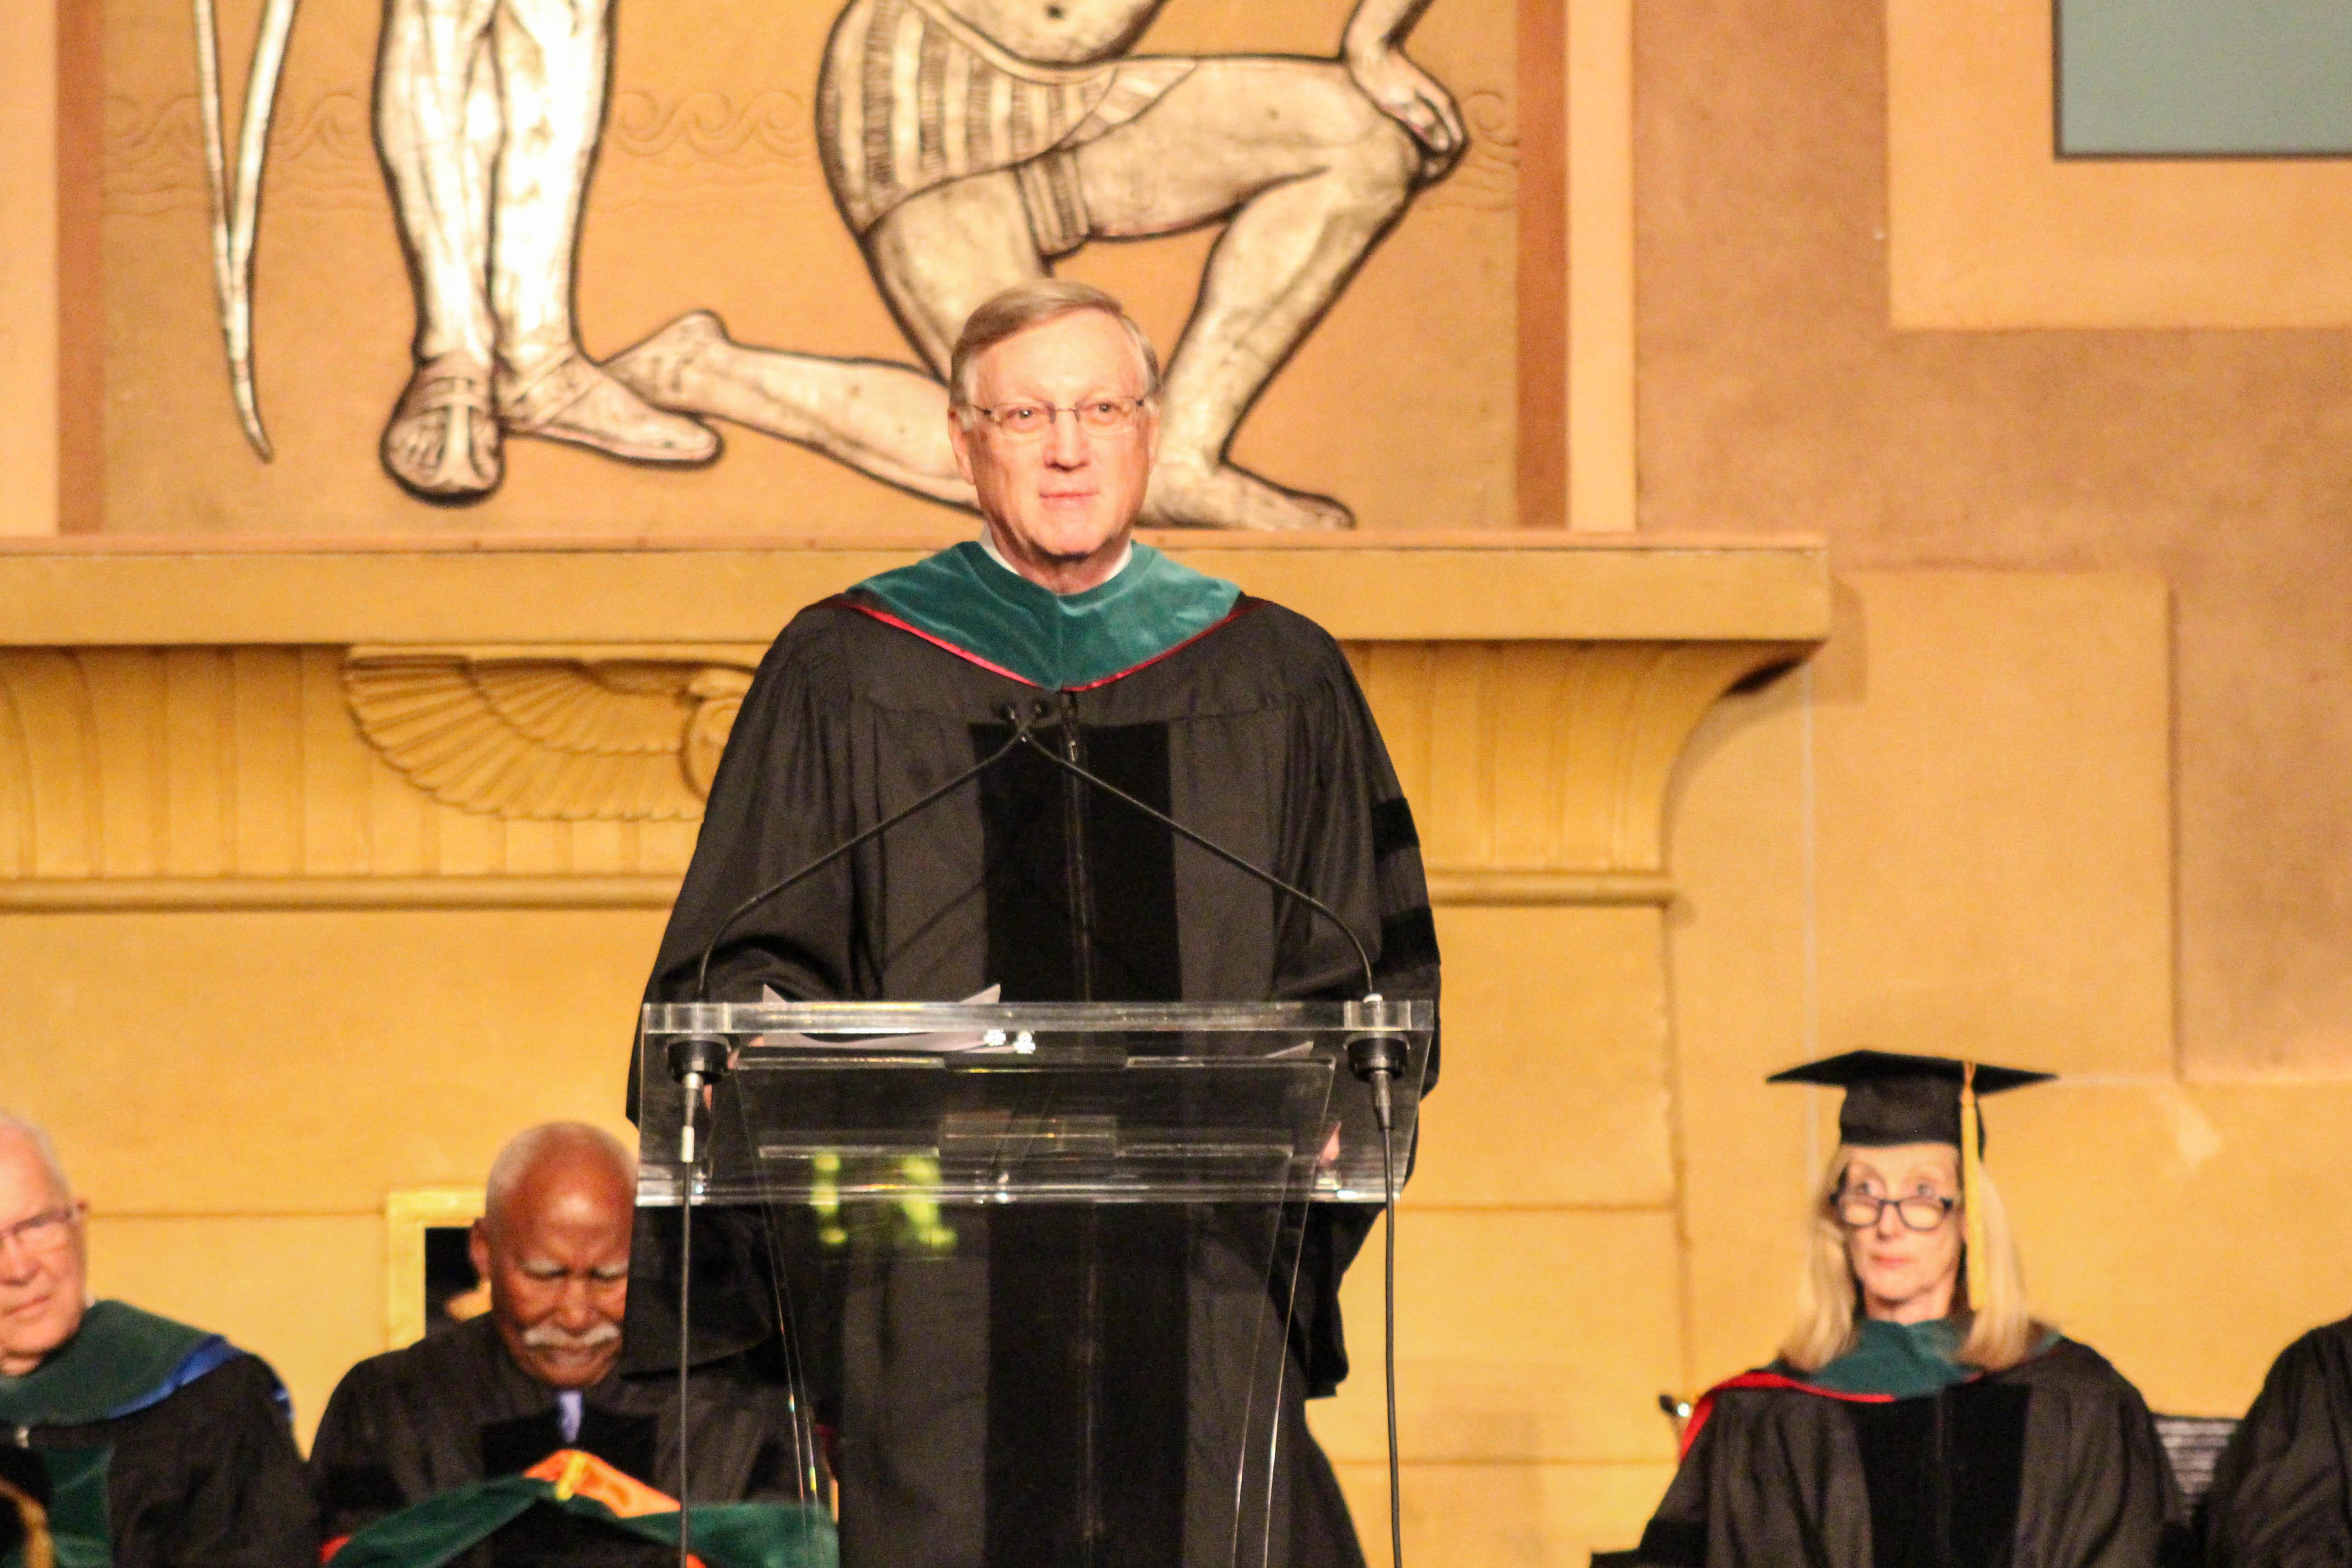 President Wilson addresses the audience